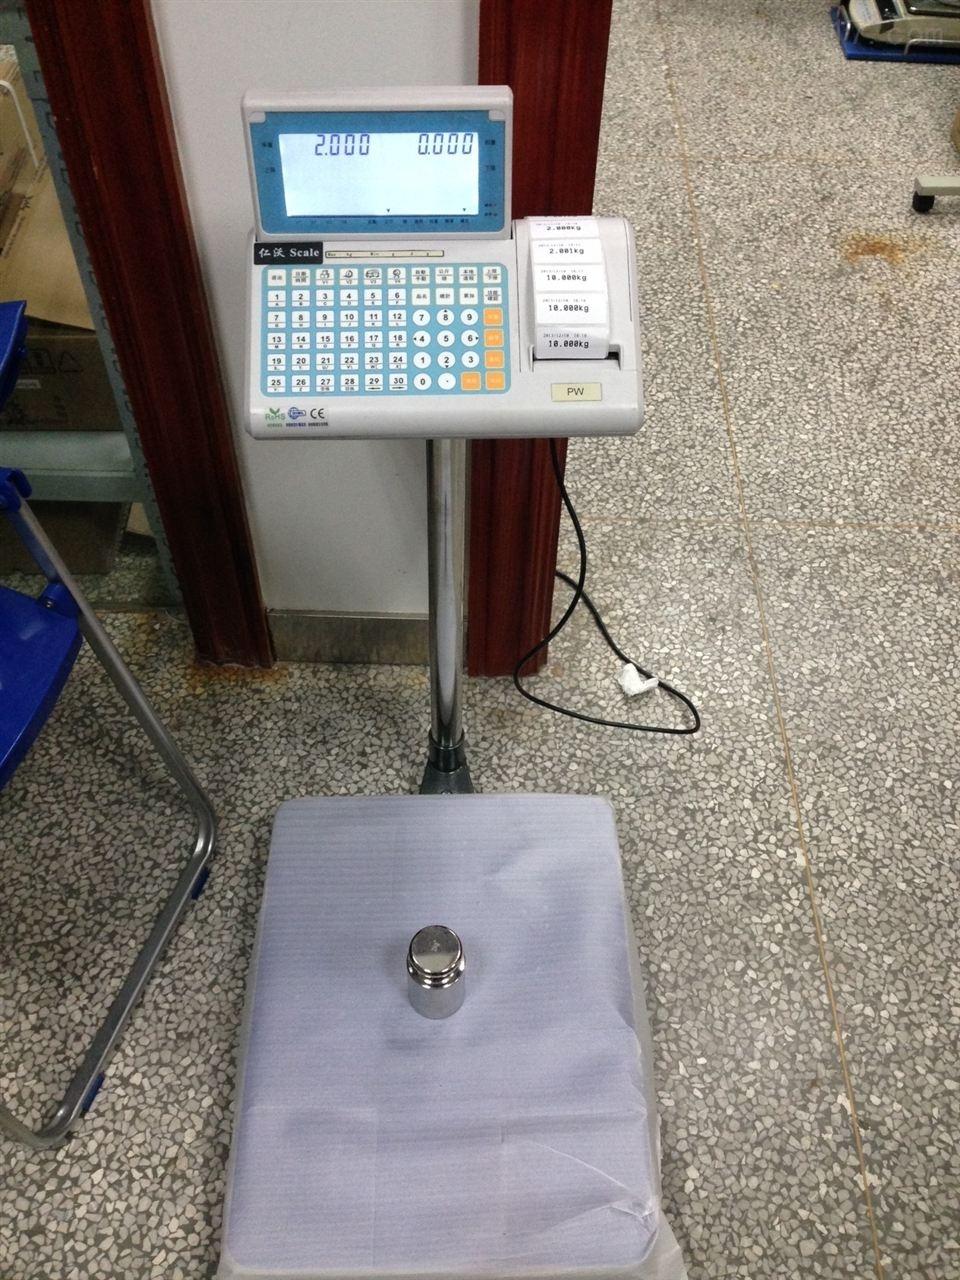 T-Scale台衡XK3108-PW内置不干胶打印电子秤